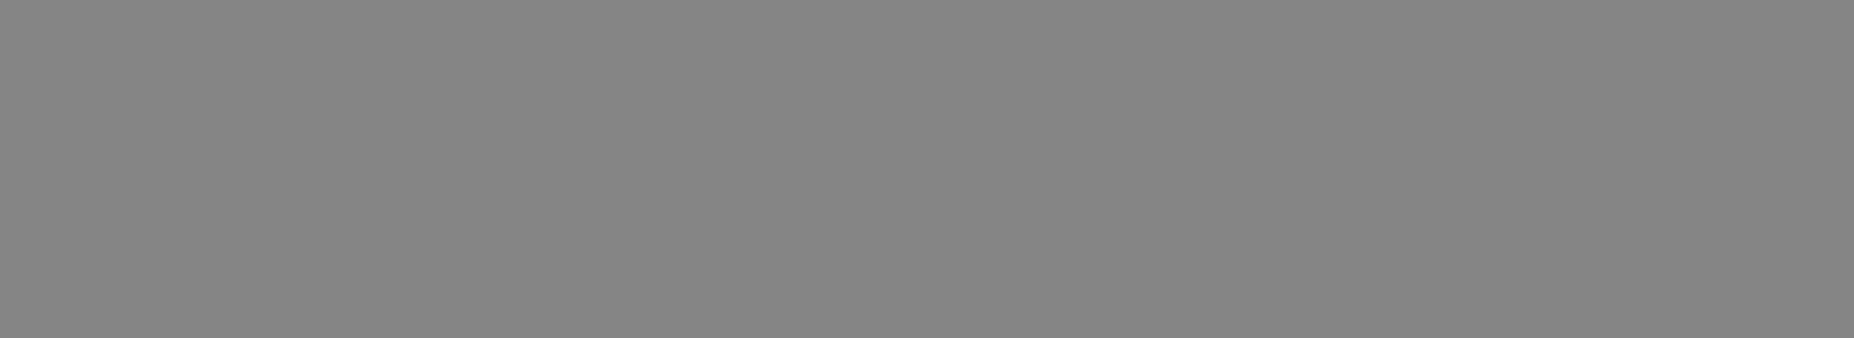 Tolan_Films_Logo_White_Transparent